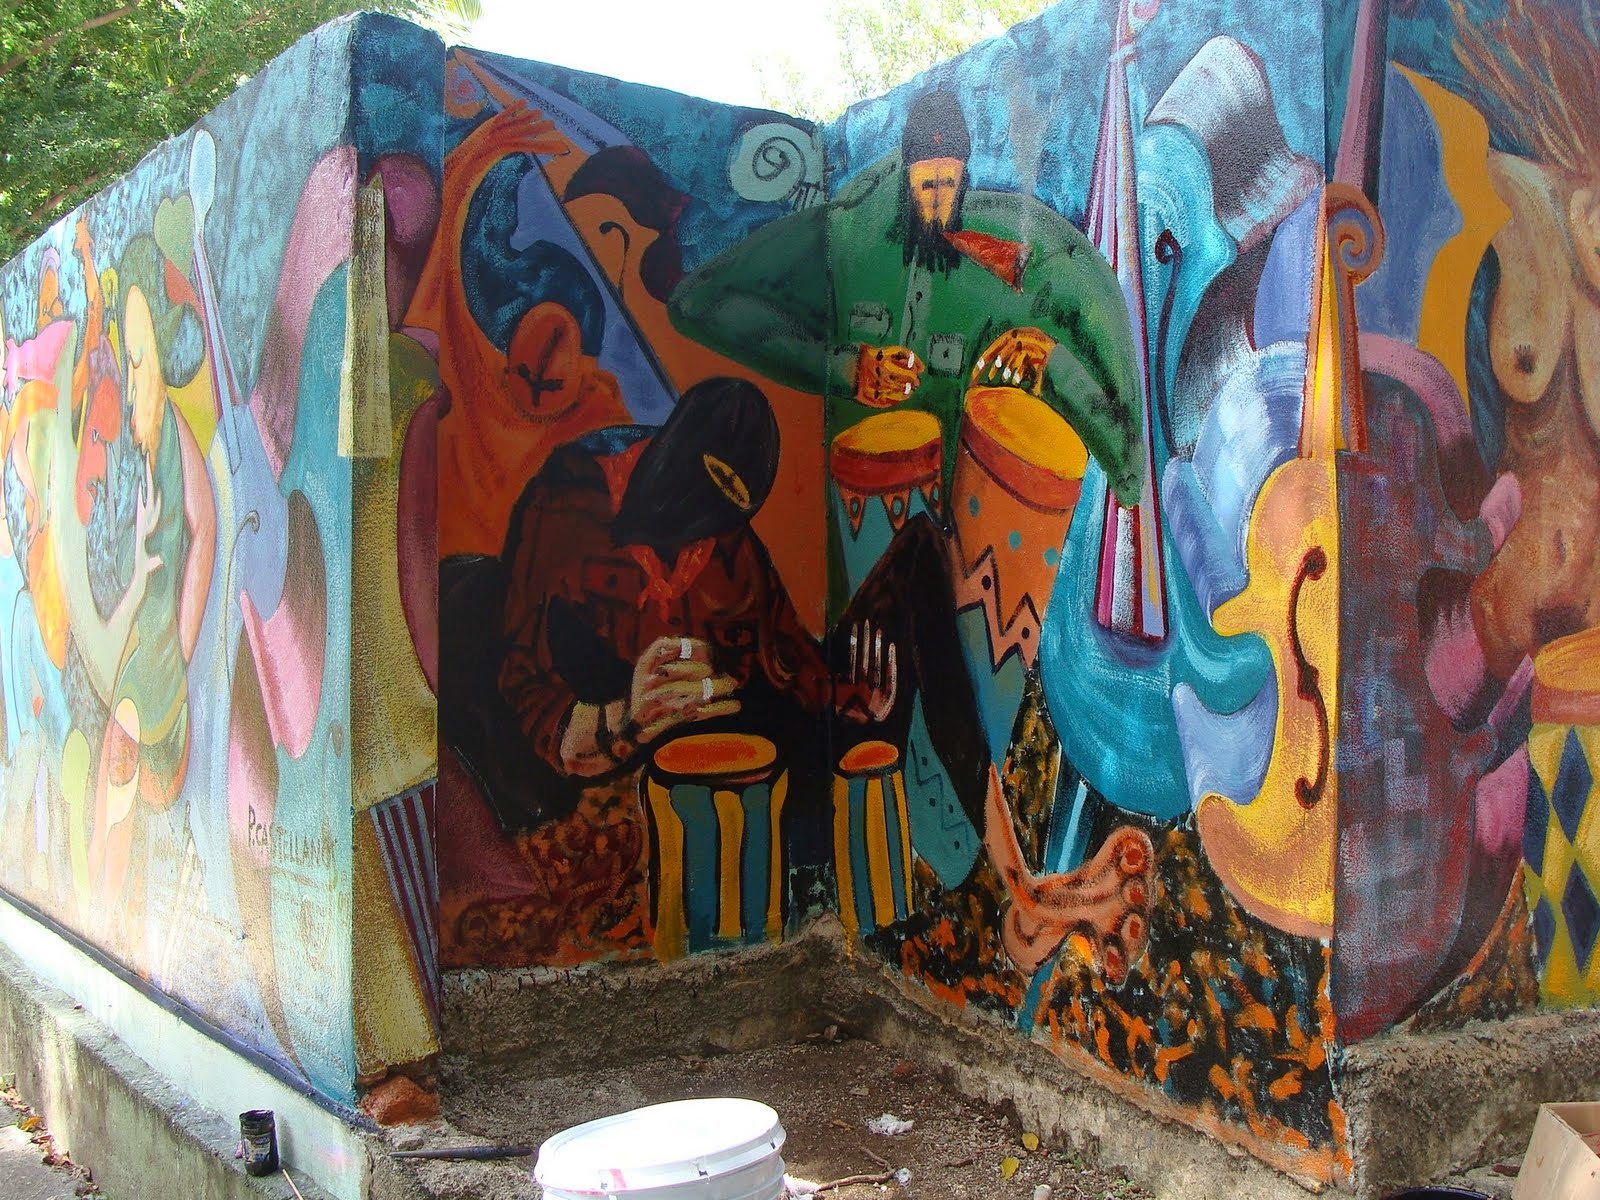 El artista mexicano abel ram rez pinta en cuba un mural for Arte colectivo mural